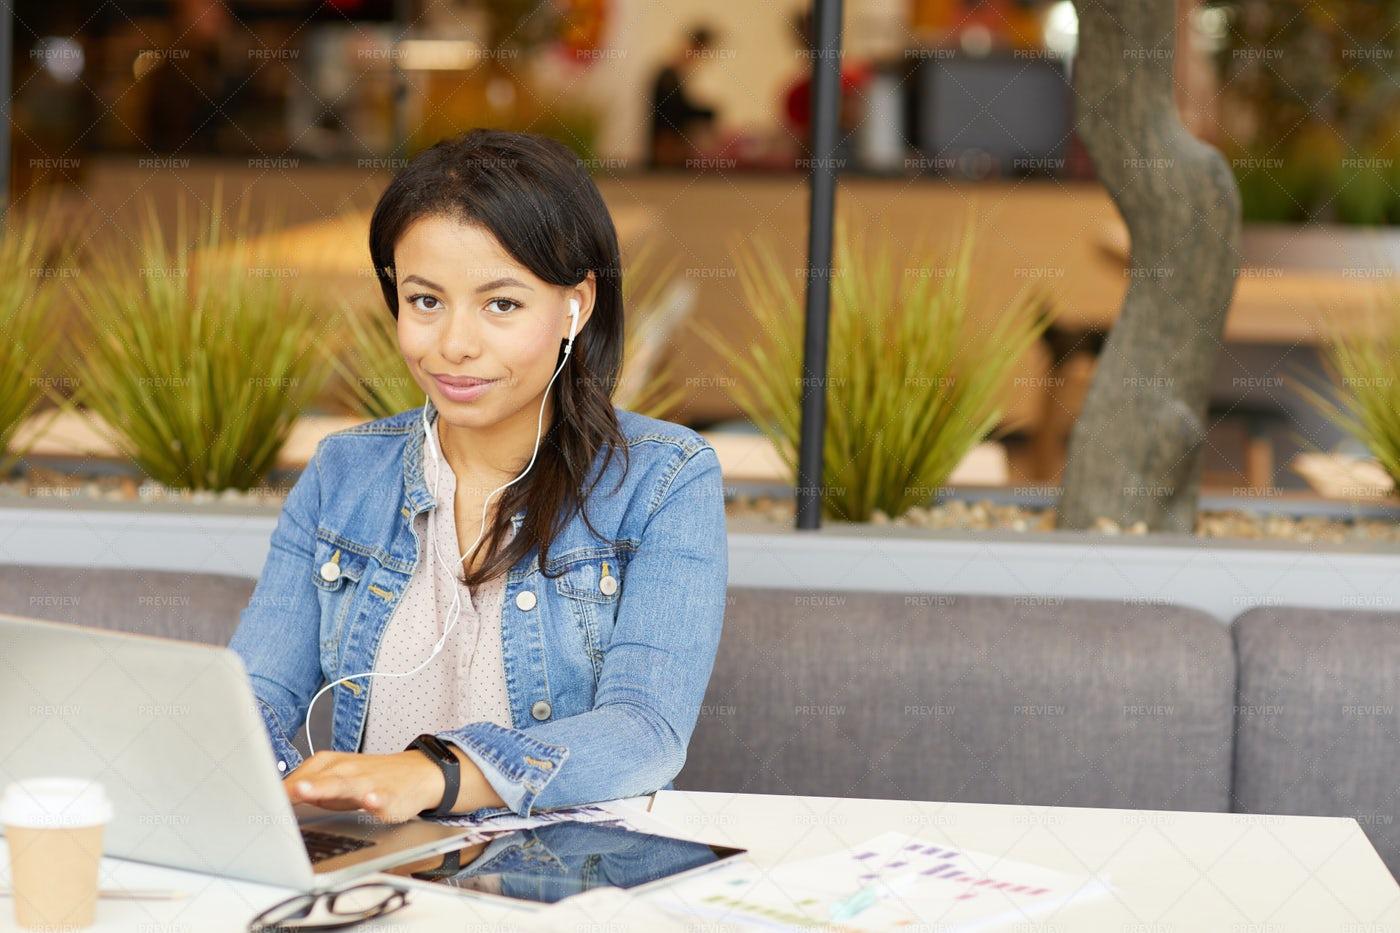 Woman Working On Laptop: Stock Photos